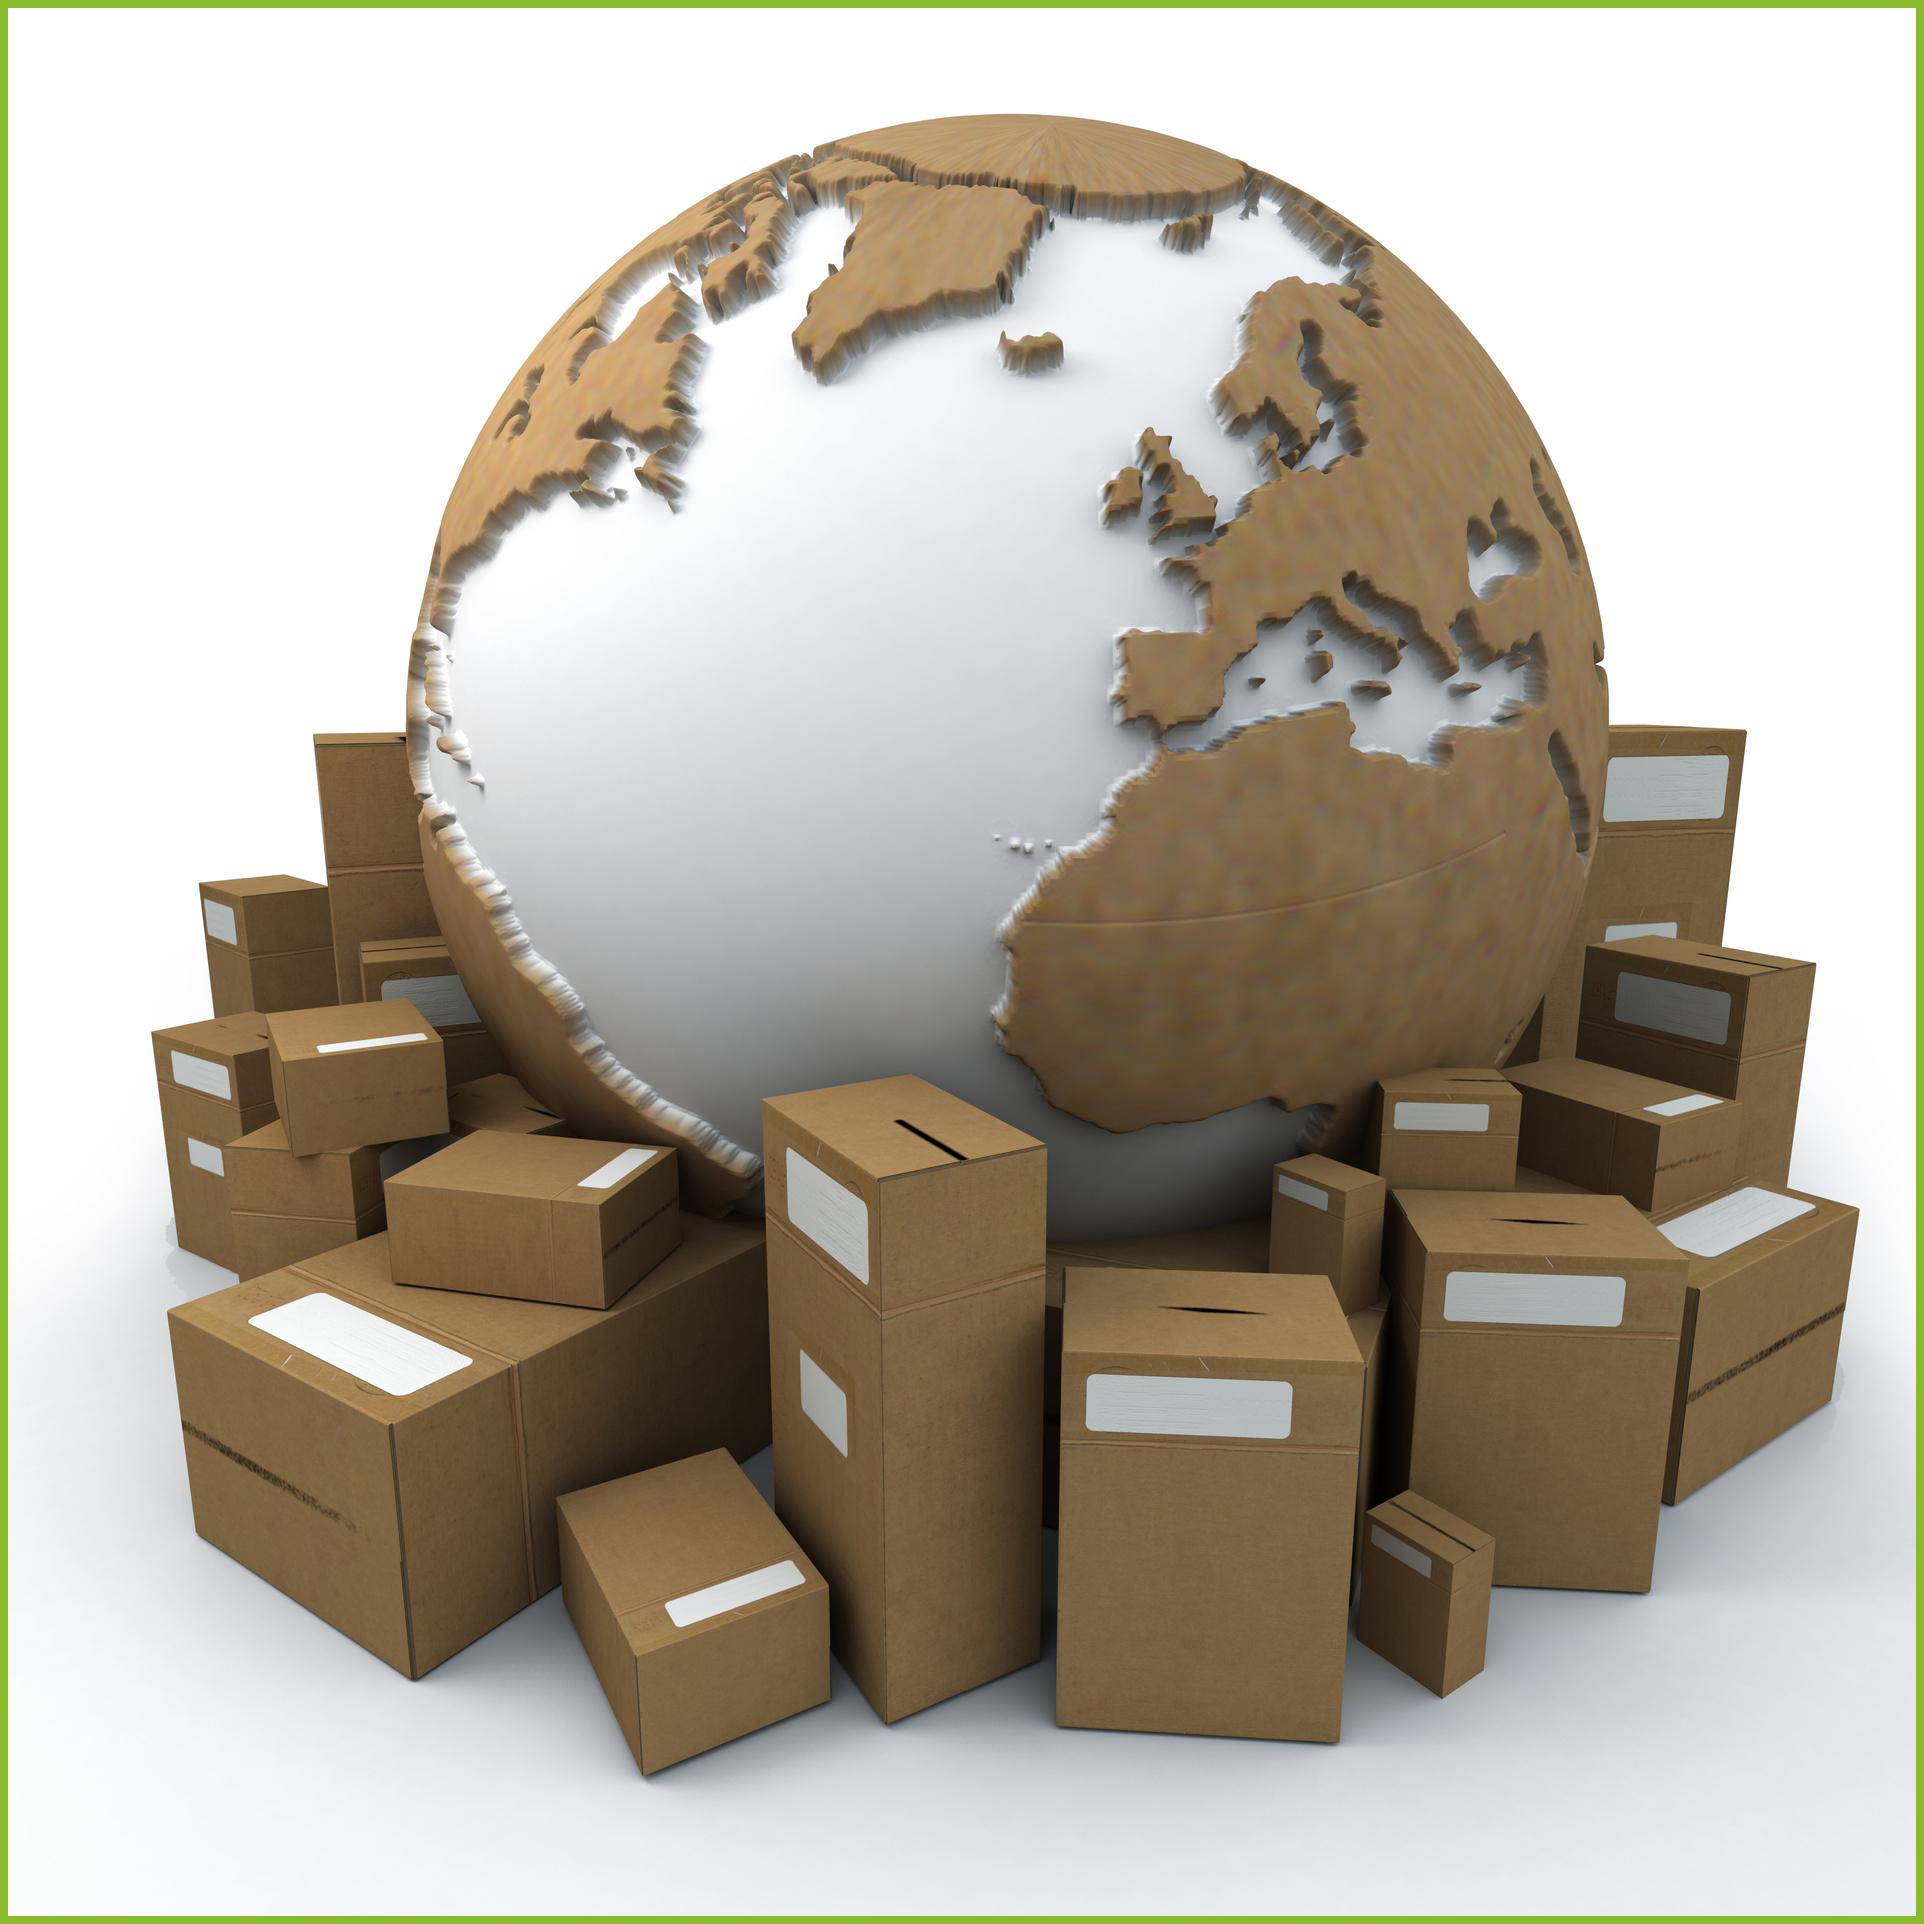 Supply Chain Management Dynamics NAV 2013